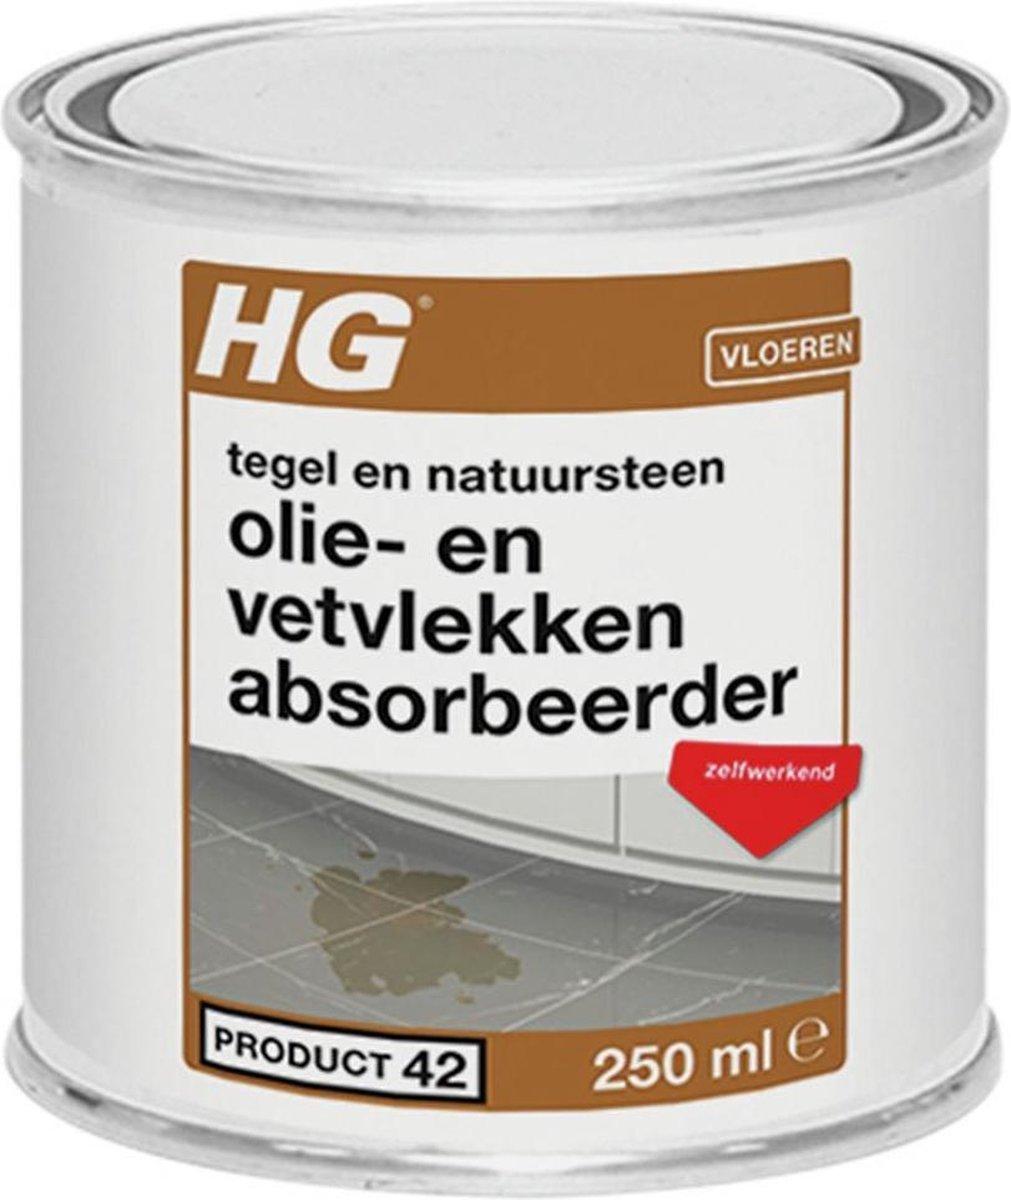 HG olie- & vetvlekken absorbeerder (HG product 42) - 250ml - zelfwerkend